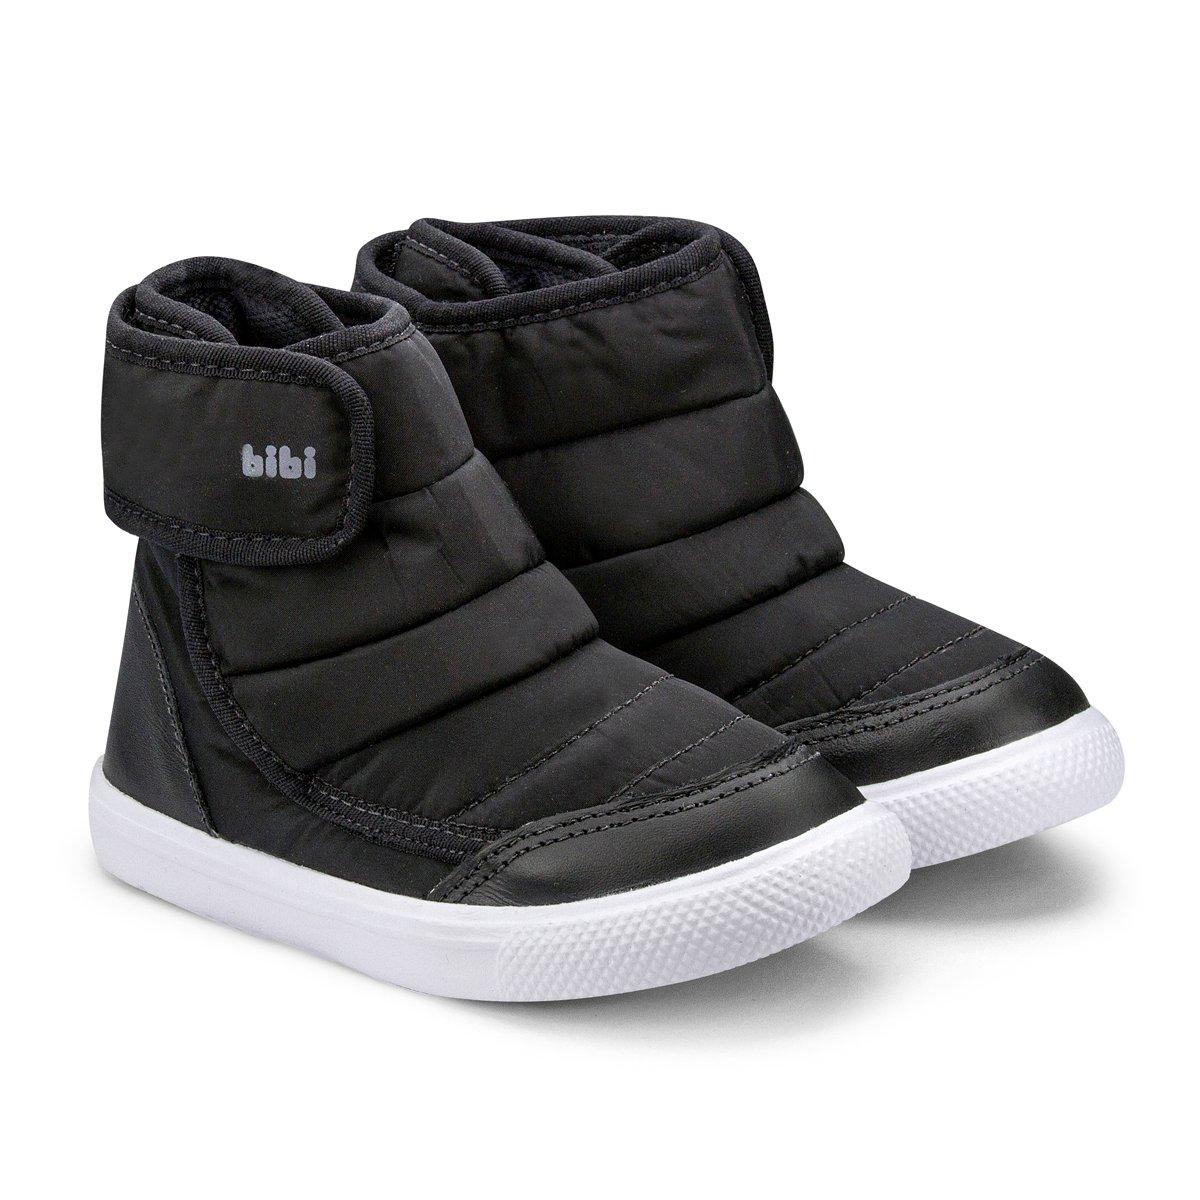 Cizme unisex cu velcro Bibi Shoes Agility imagine